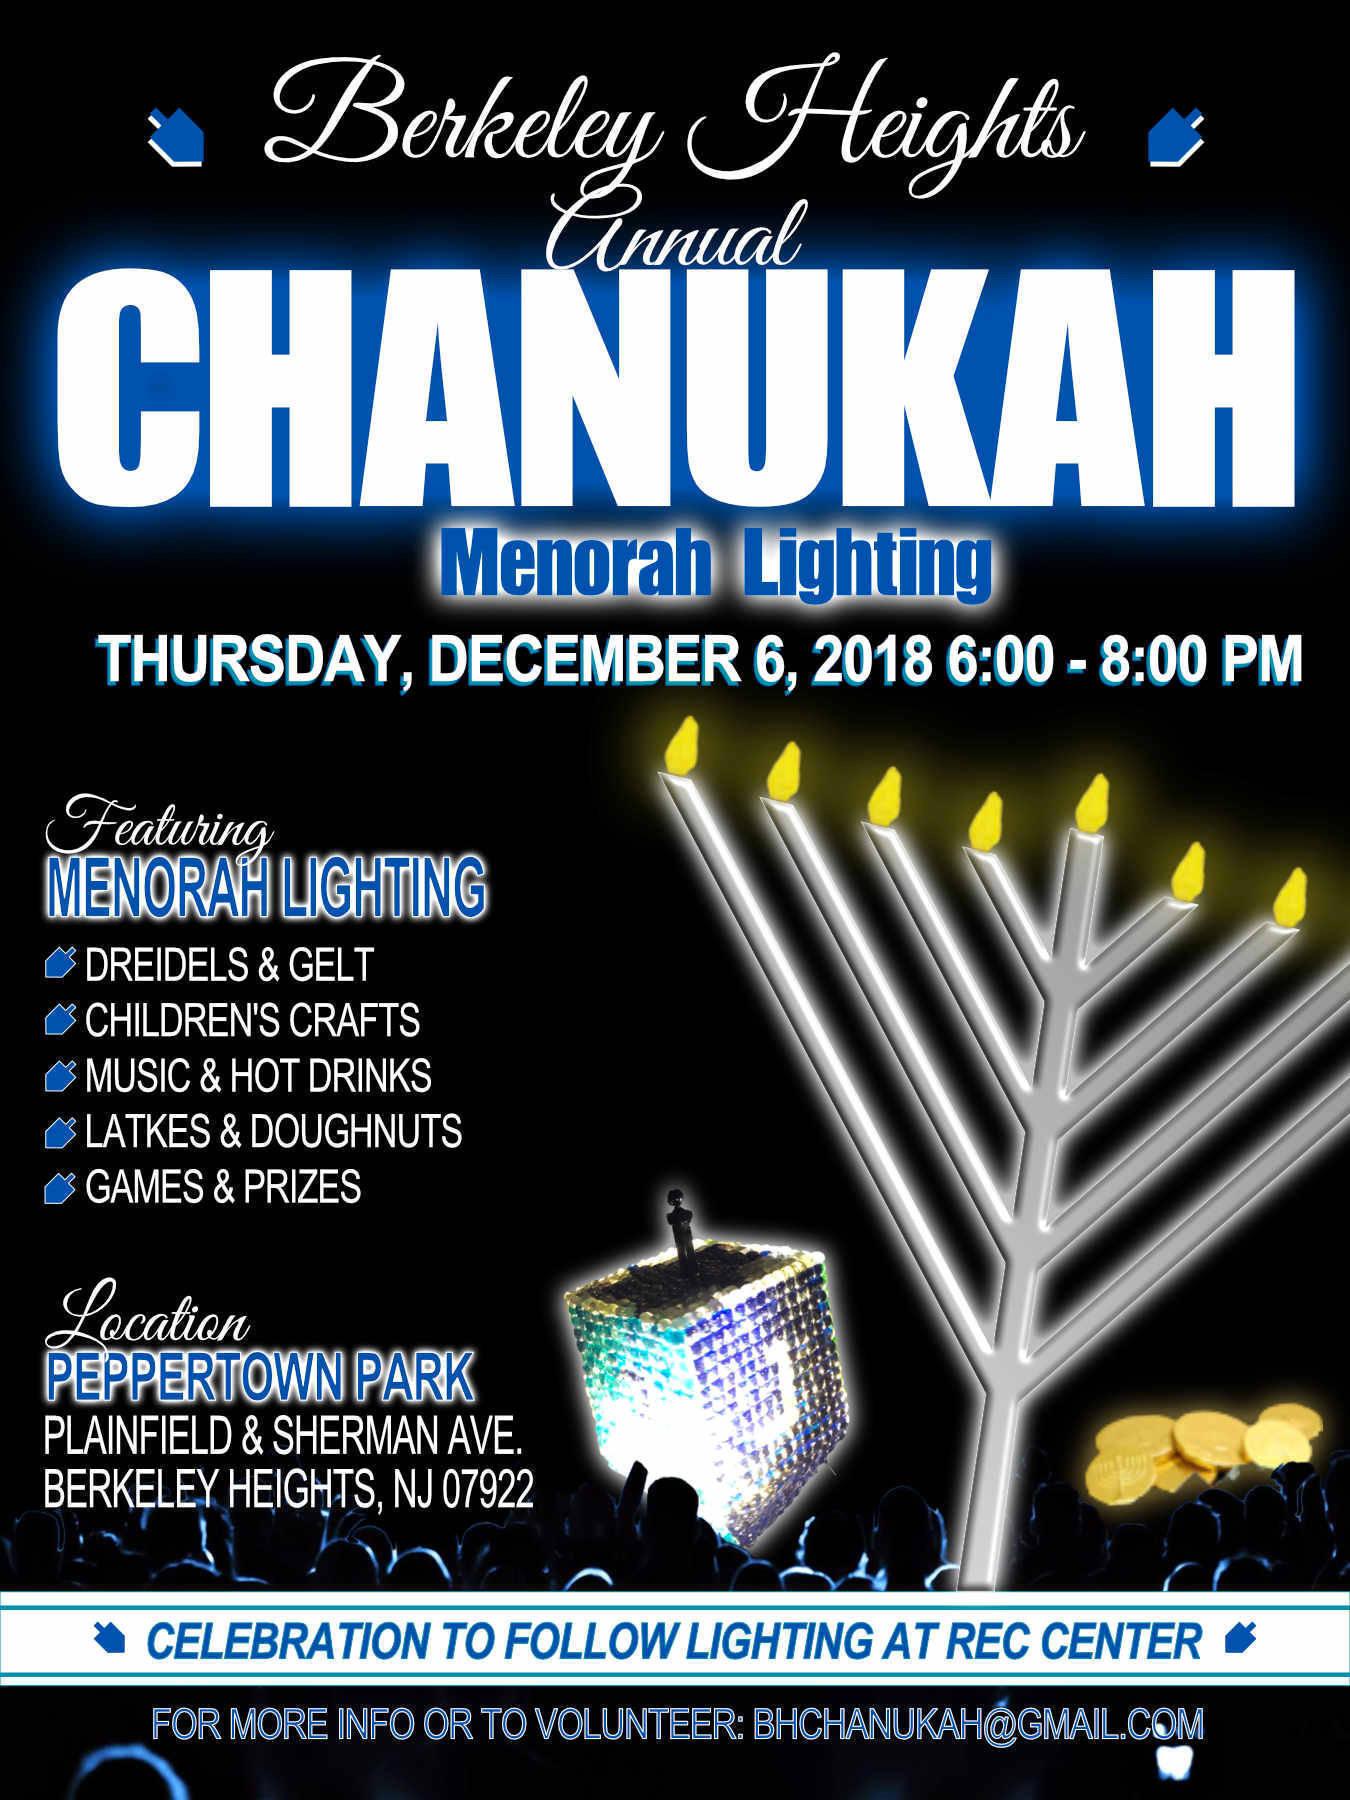 Annual Menorah Lighting Set For Dec 6